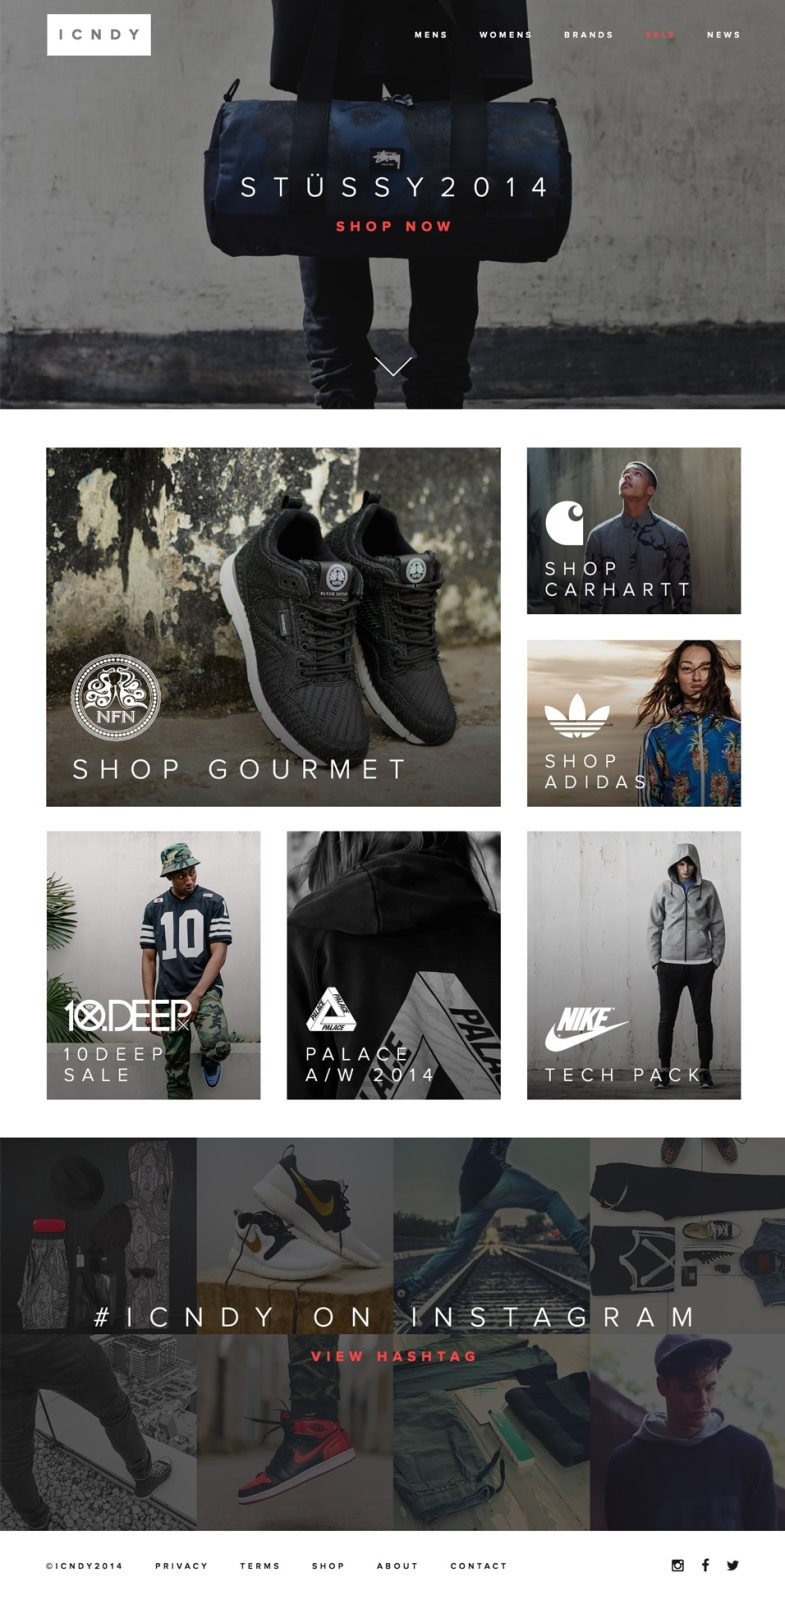 ICNDY E commerce Clothing Web Template Бесплатные шаблоны для интернет-магазина psd - ICNDY E commerce Clothing Web Template - Бесплатные шаблоны для интернет-магазина PSD